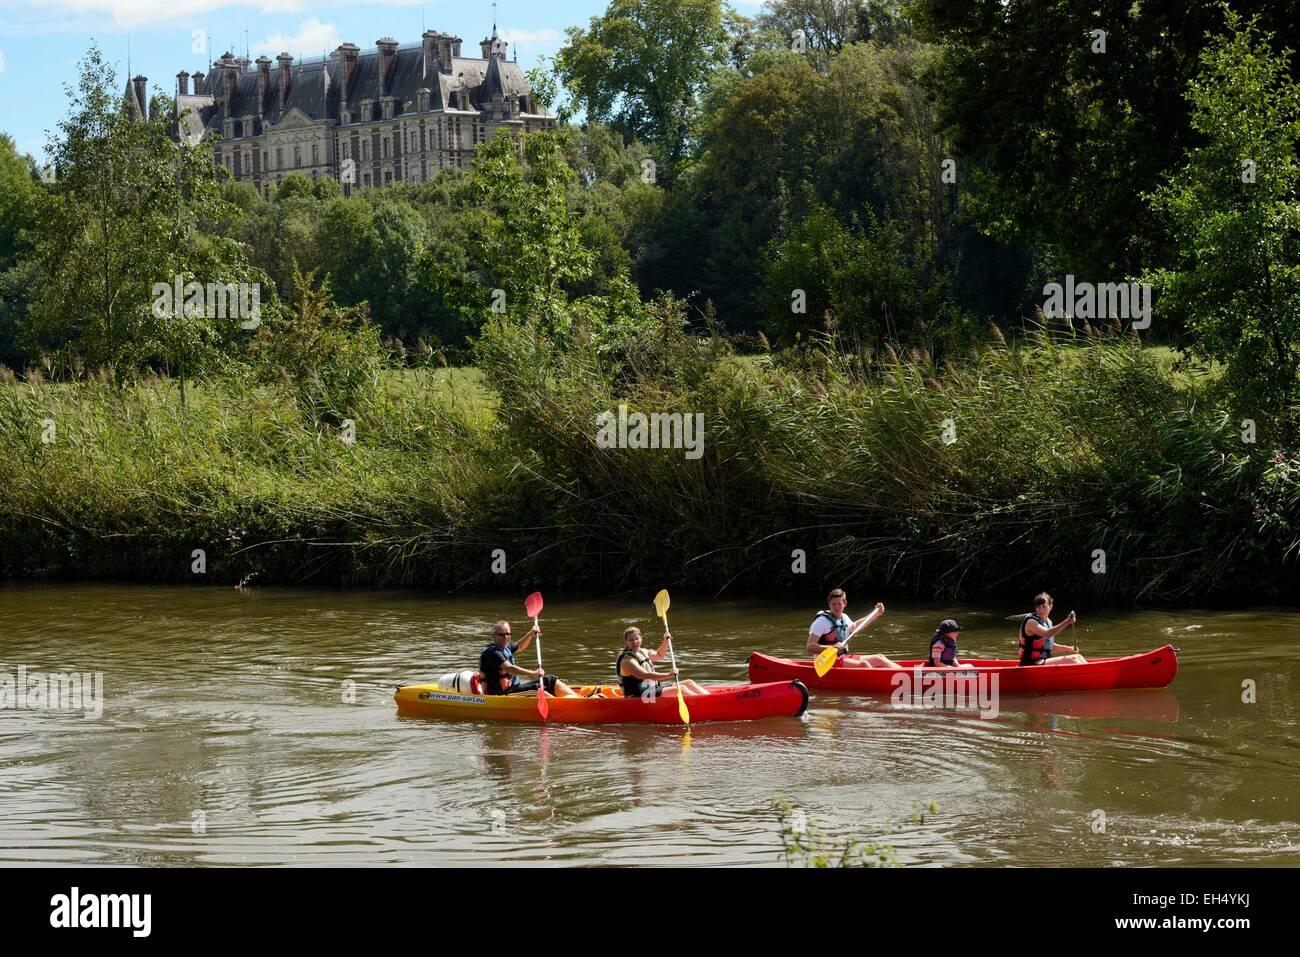 France, Haute Saone, Villersexel, Ognon river, canoeing, Grammont castle dated 1880 - Stock Image